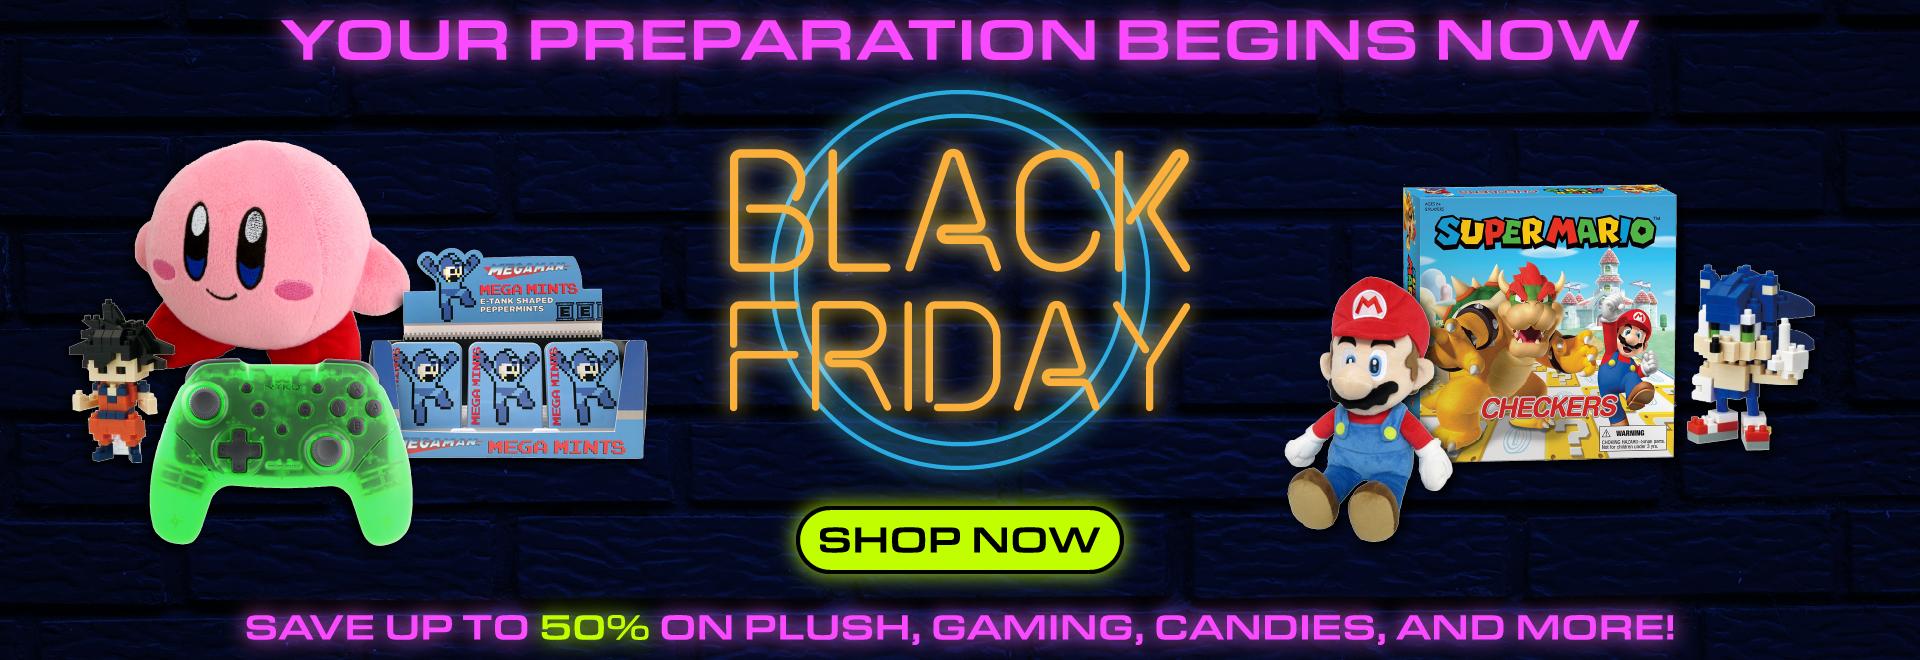 Prepare for Black Friday